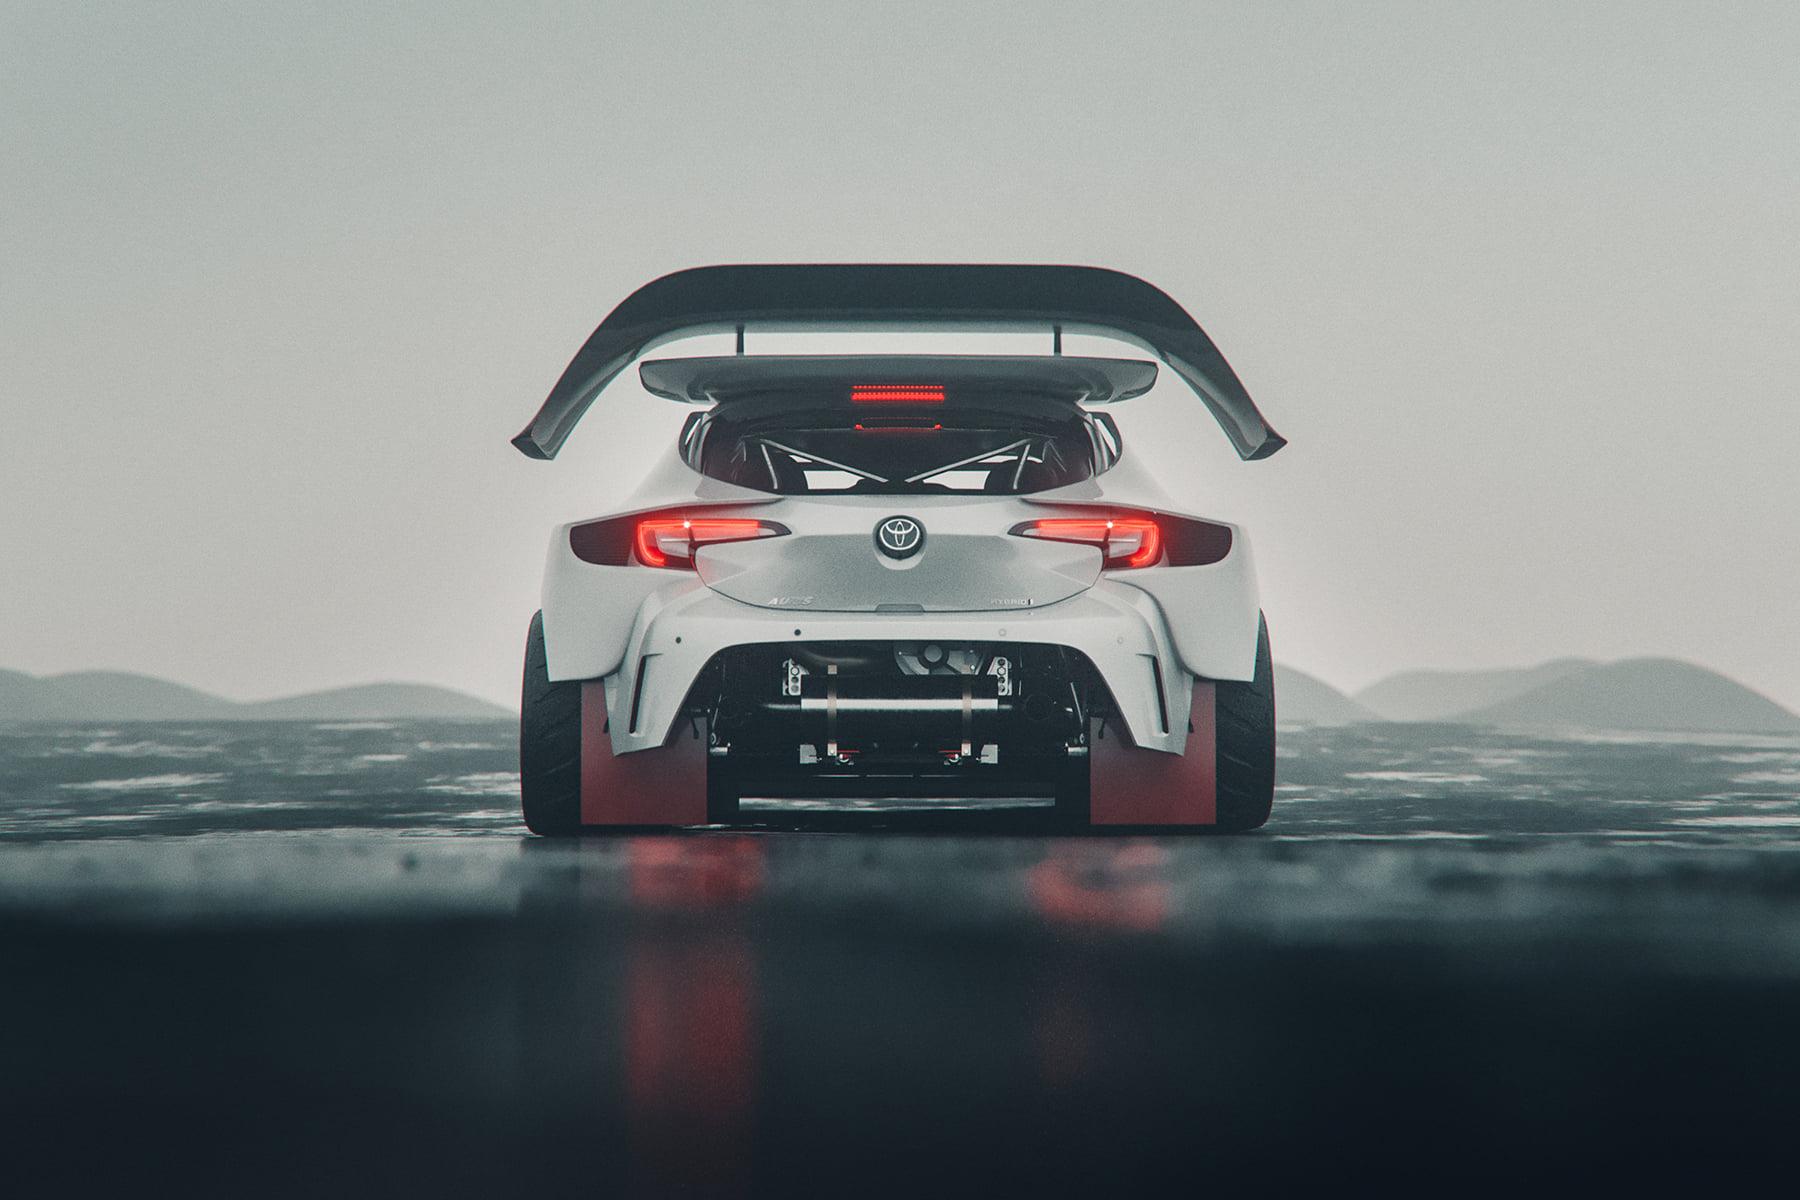 Toyota-GR-Corolla-Group-B-rally-car-8